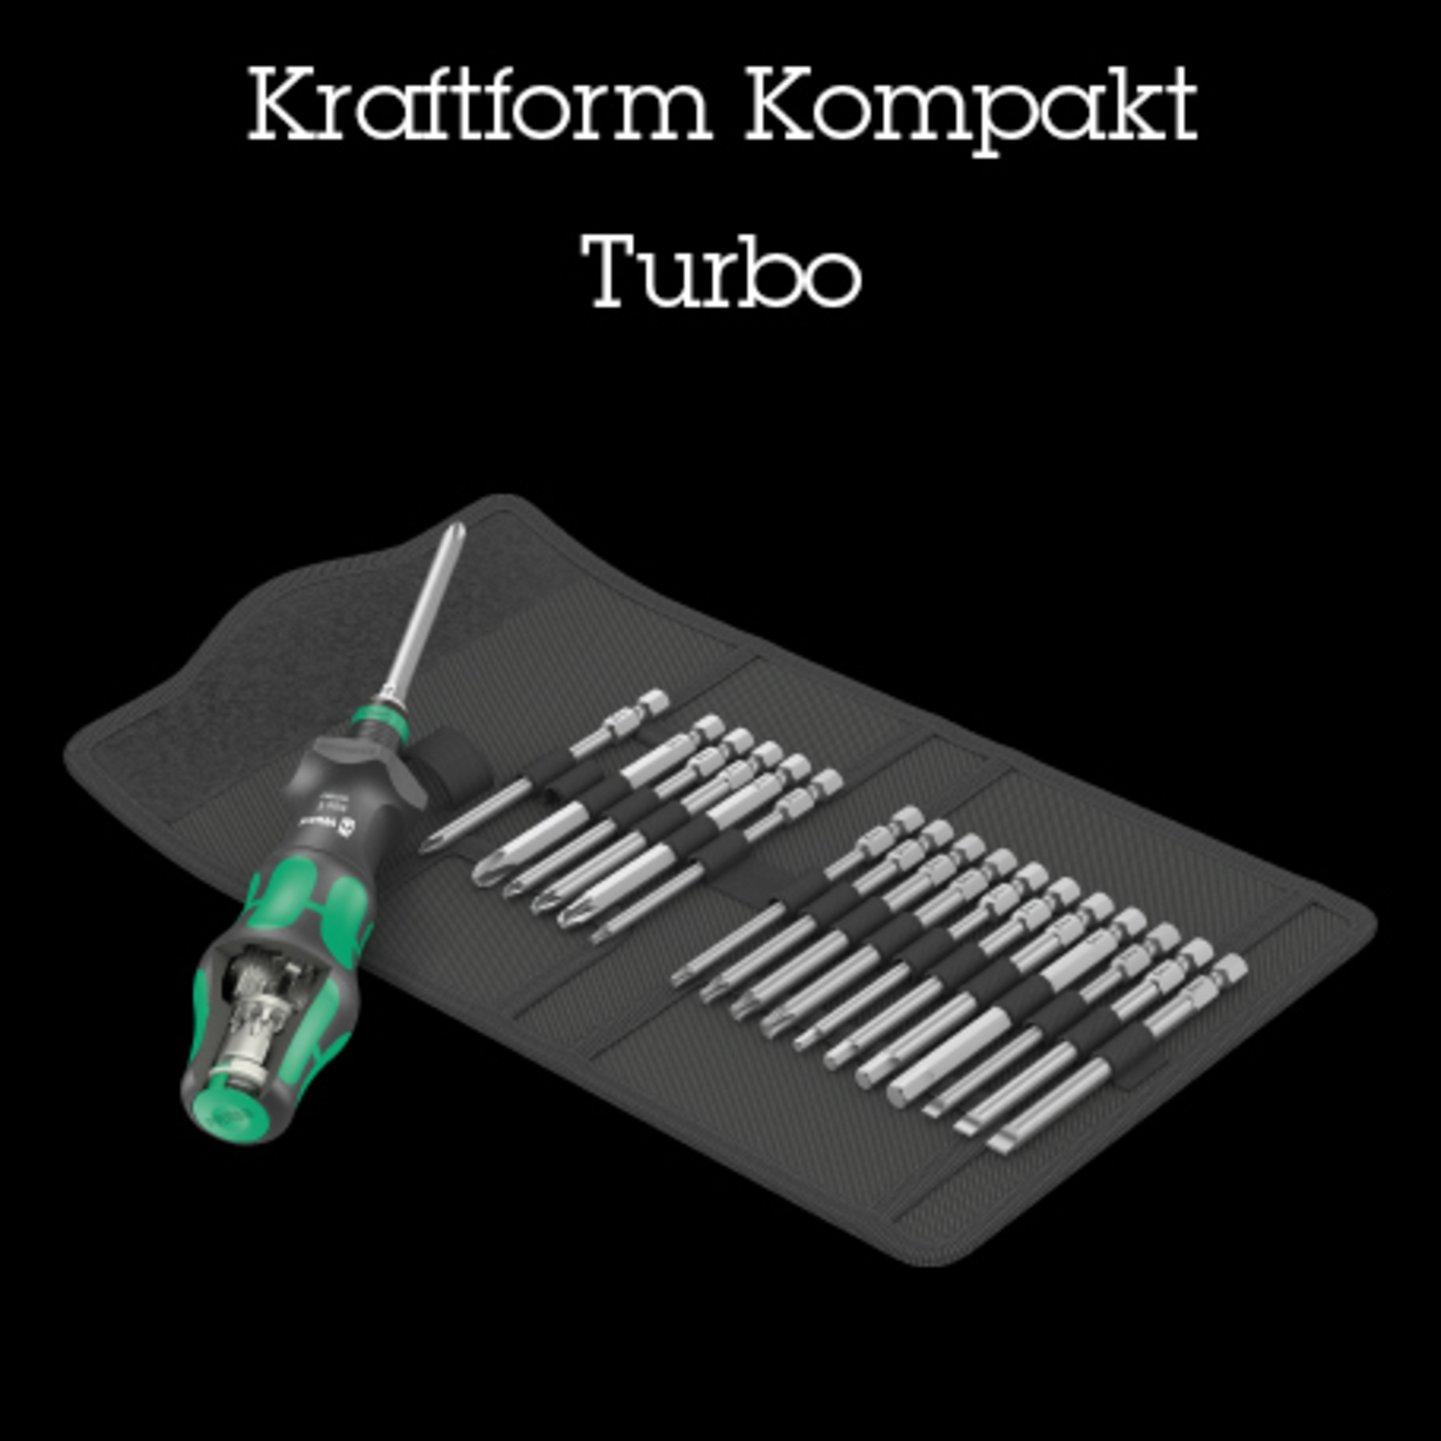 Kraftform Kompakt Turbo